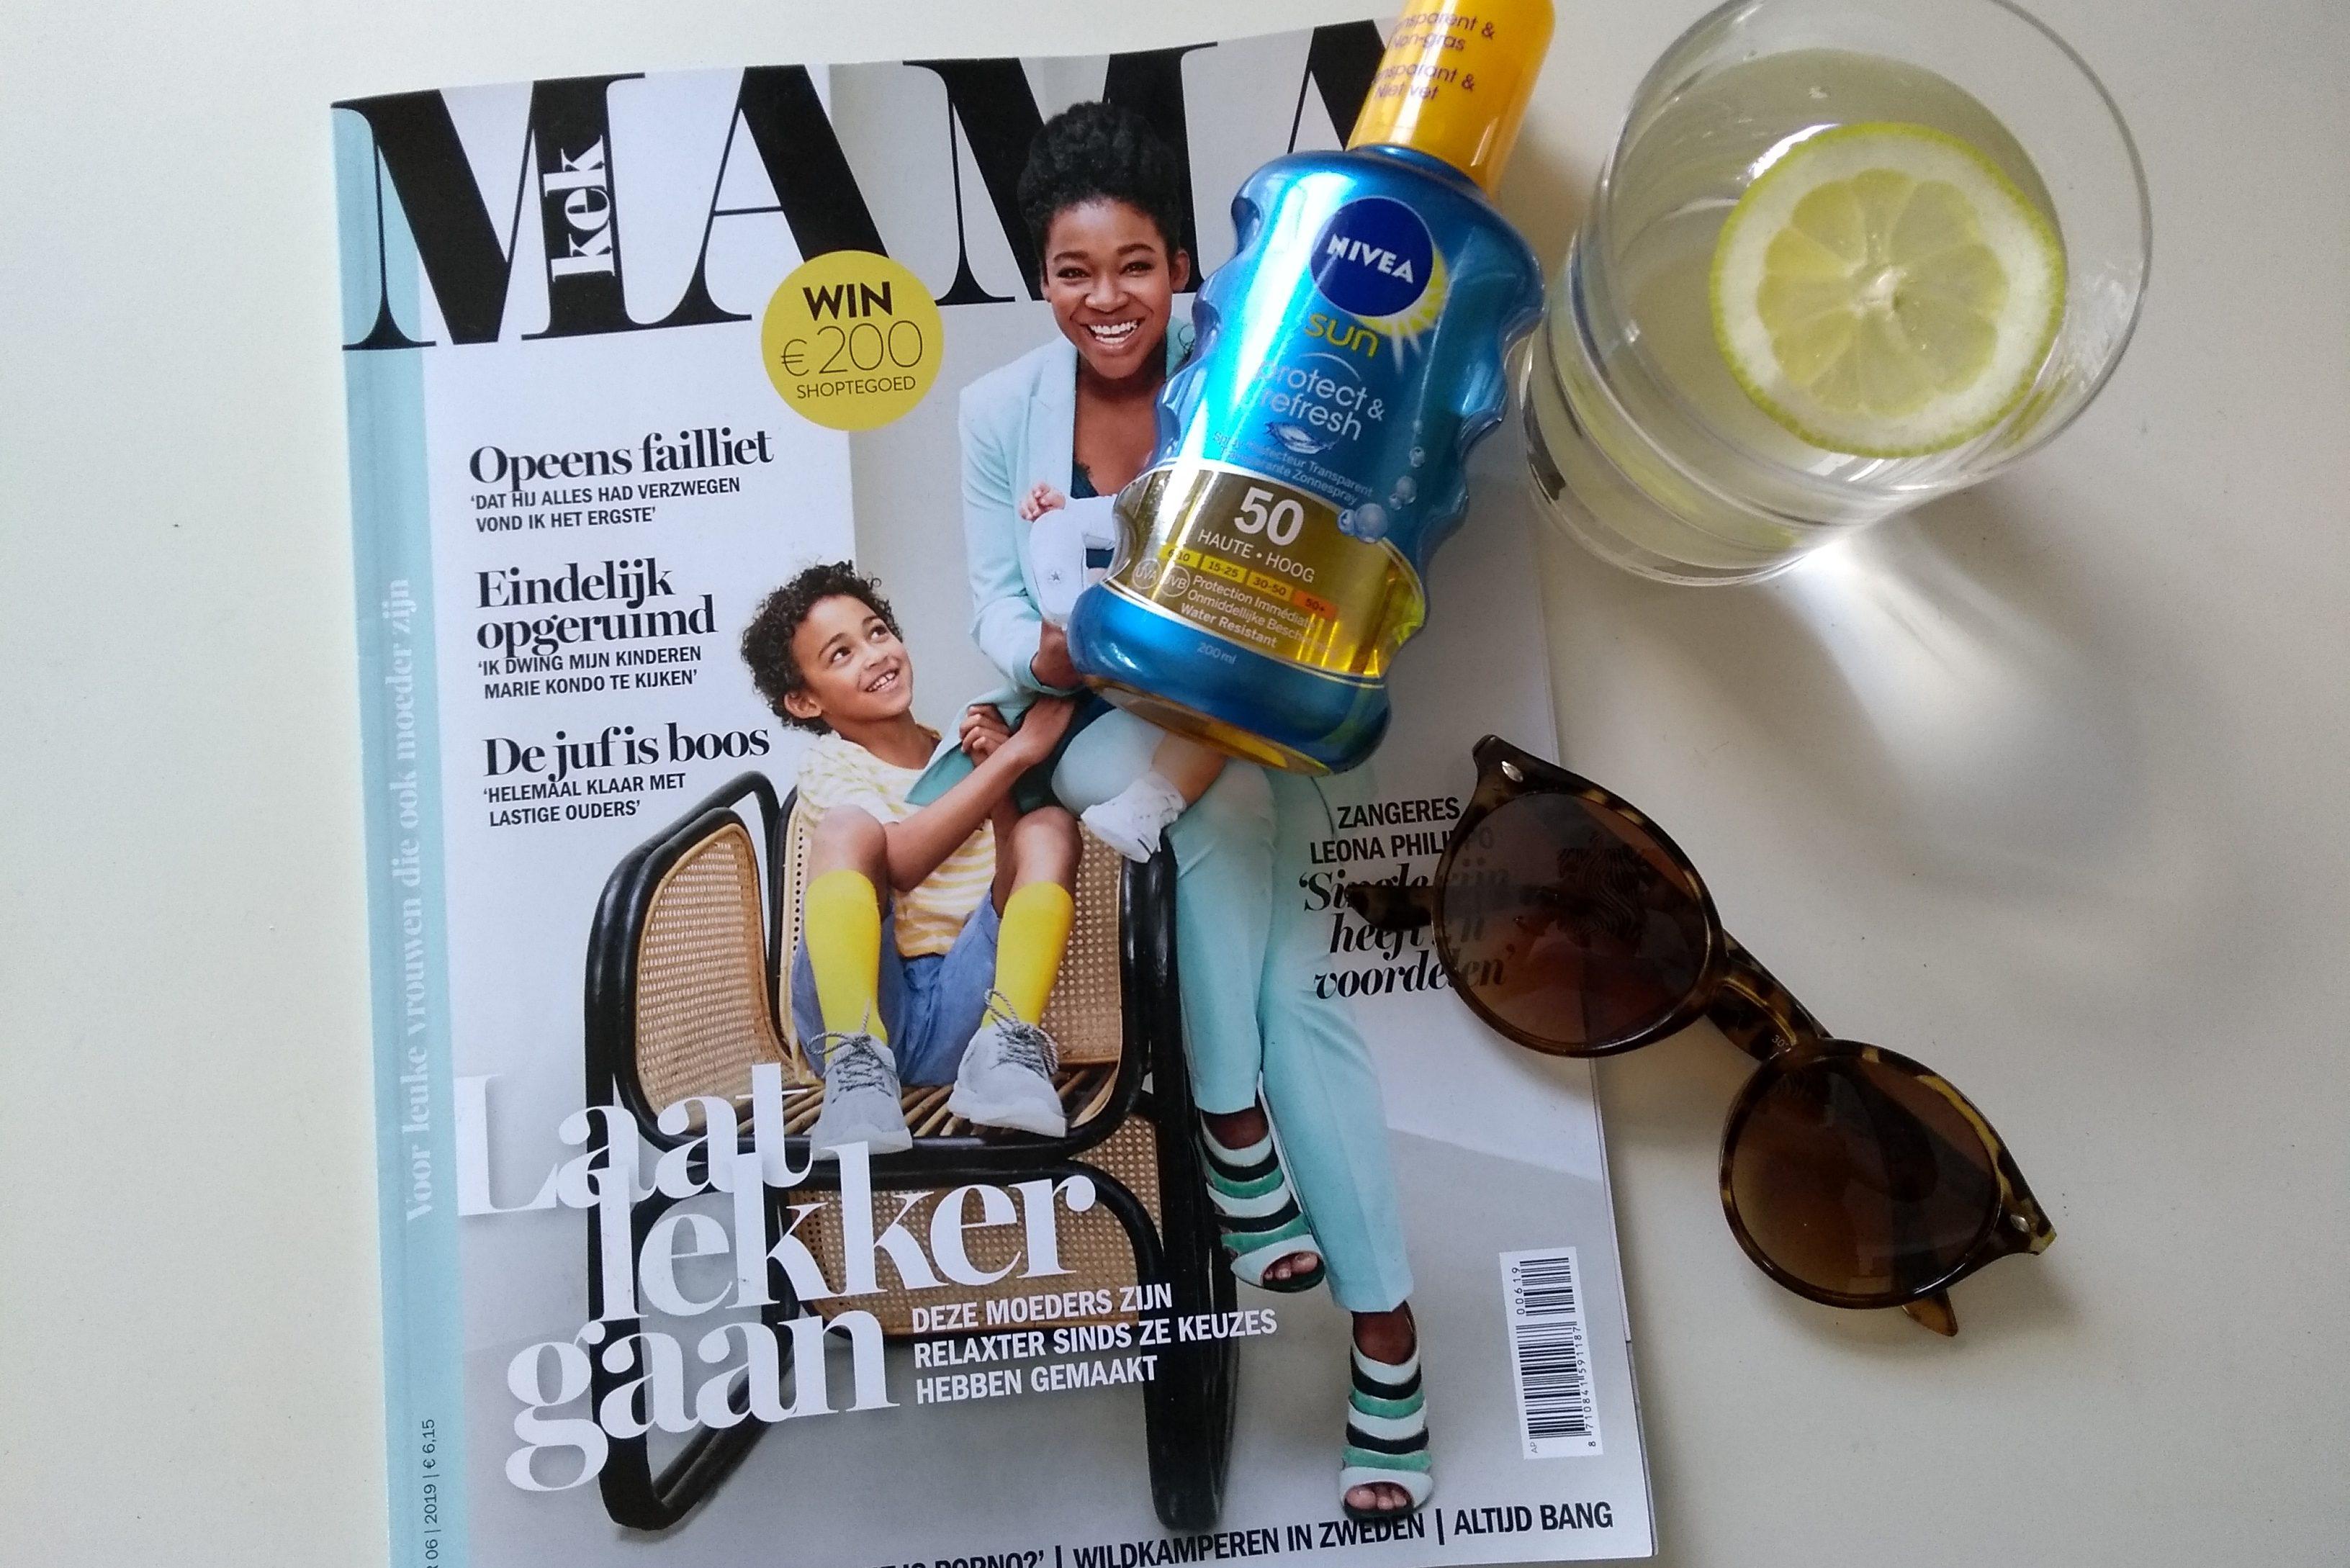 zomervakantie, zomer, vakantie, gezin, schoolvakantie, vakantie met kinderen, gezinsvakantie, relaxen, samen zijn, quality time, genieten, zomer, zon, mamablog, mamalifestyle, mama, lalog, lalogblog, lalog.nl